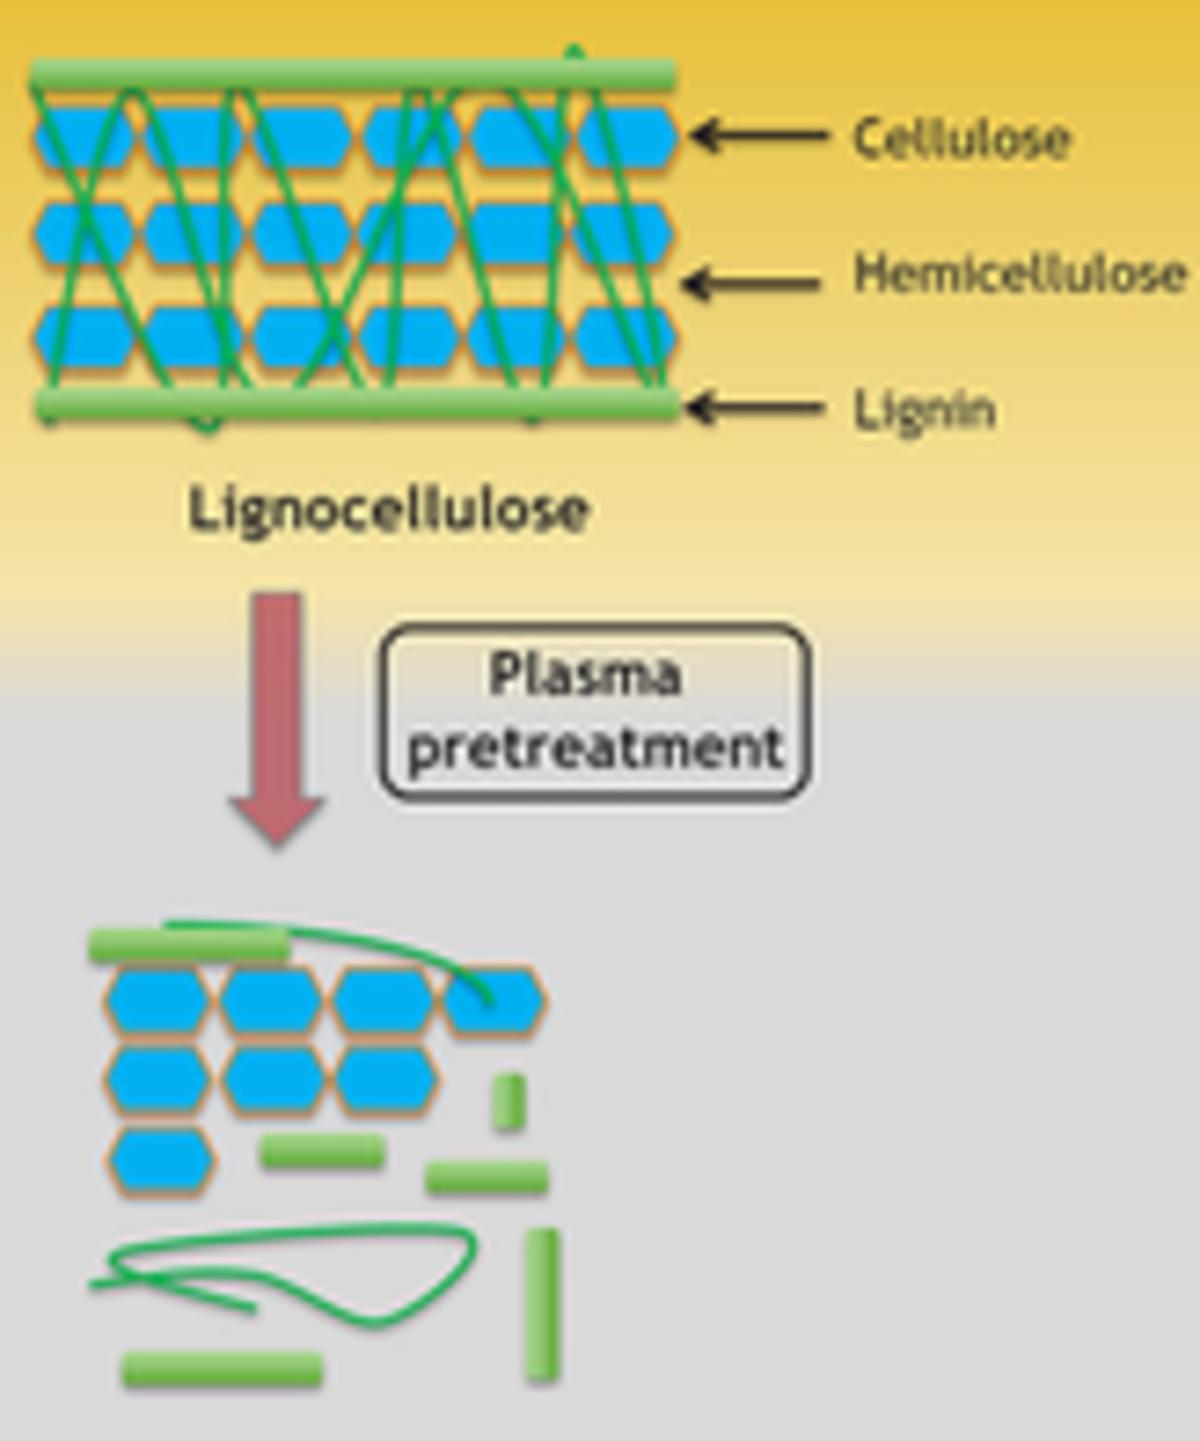 Unconventional Pretreatment of Lignocellulose with Low‐Temperature Plasma